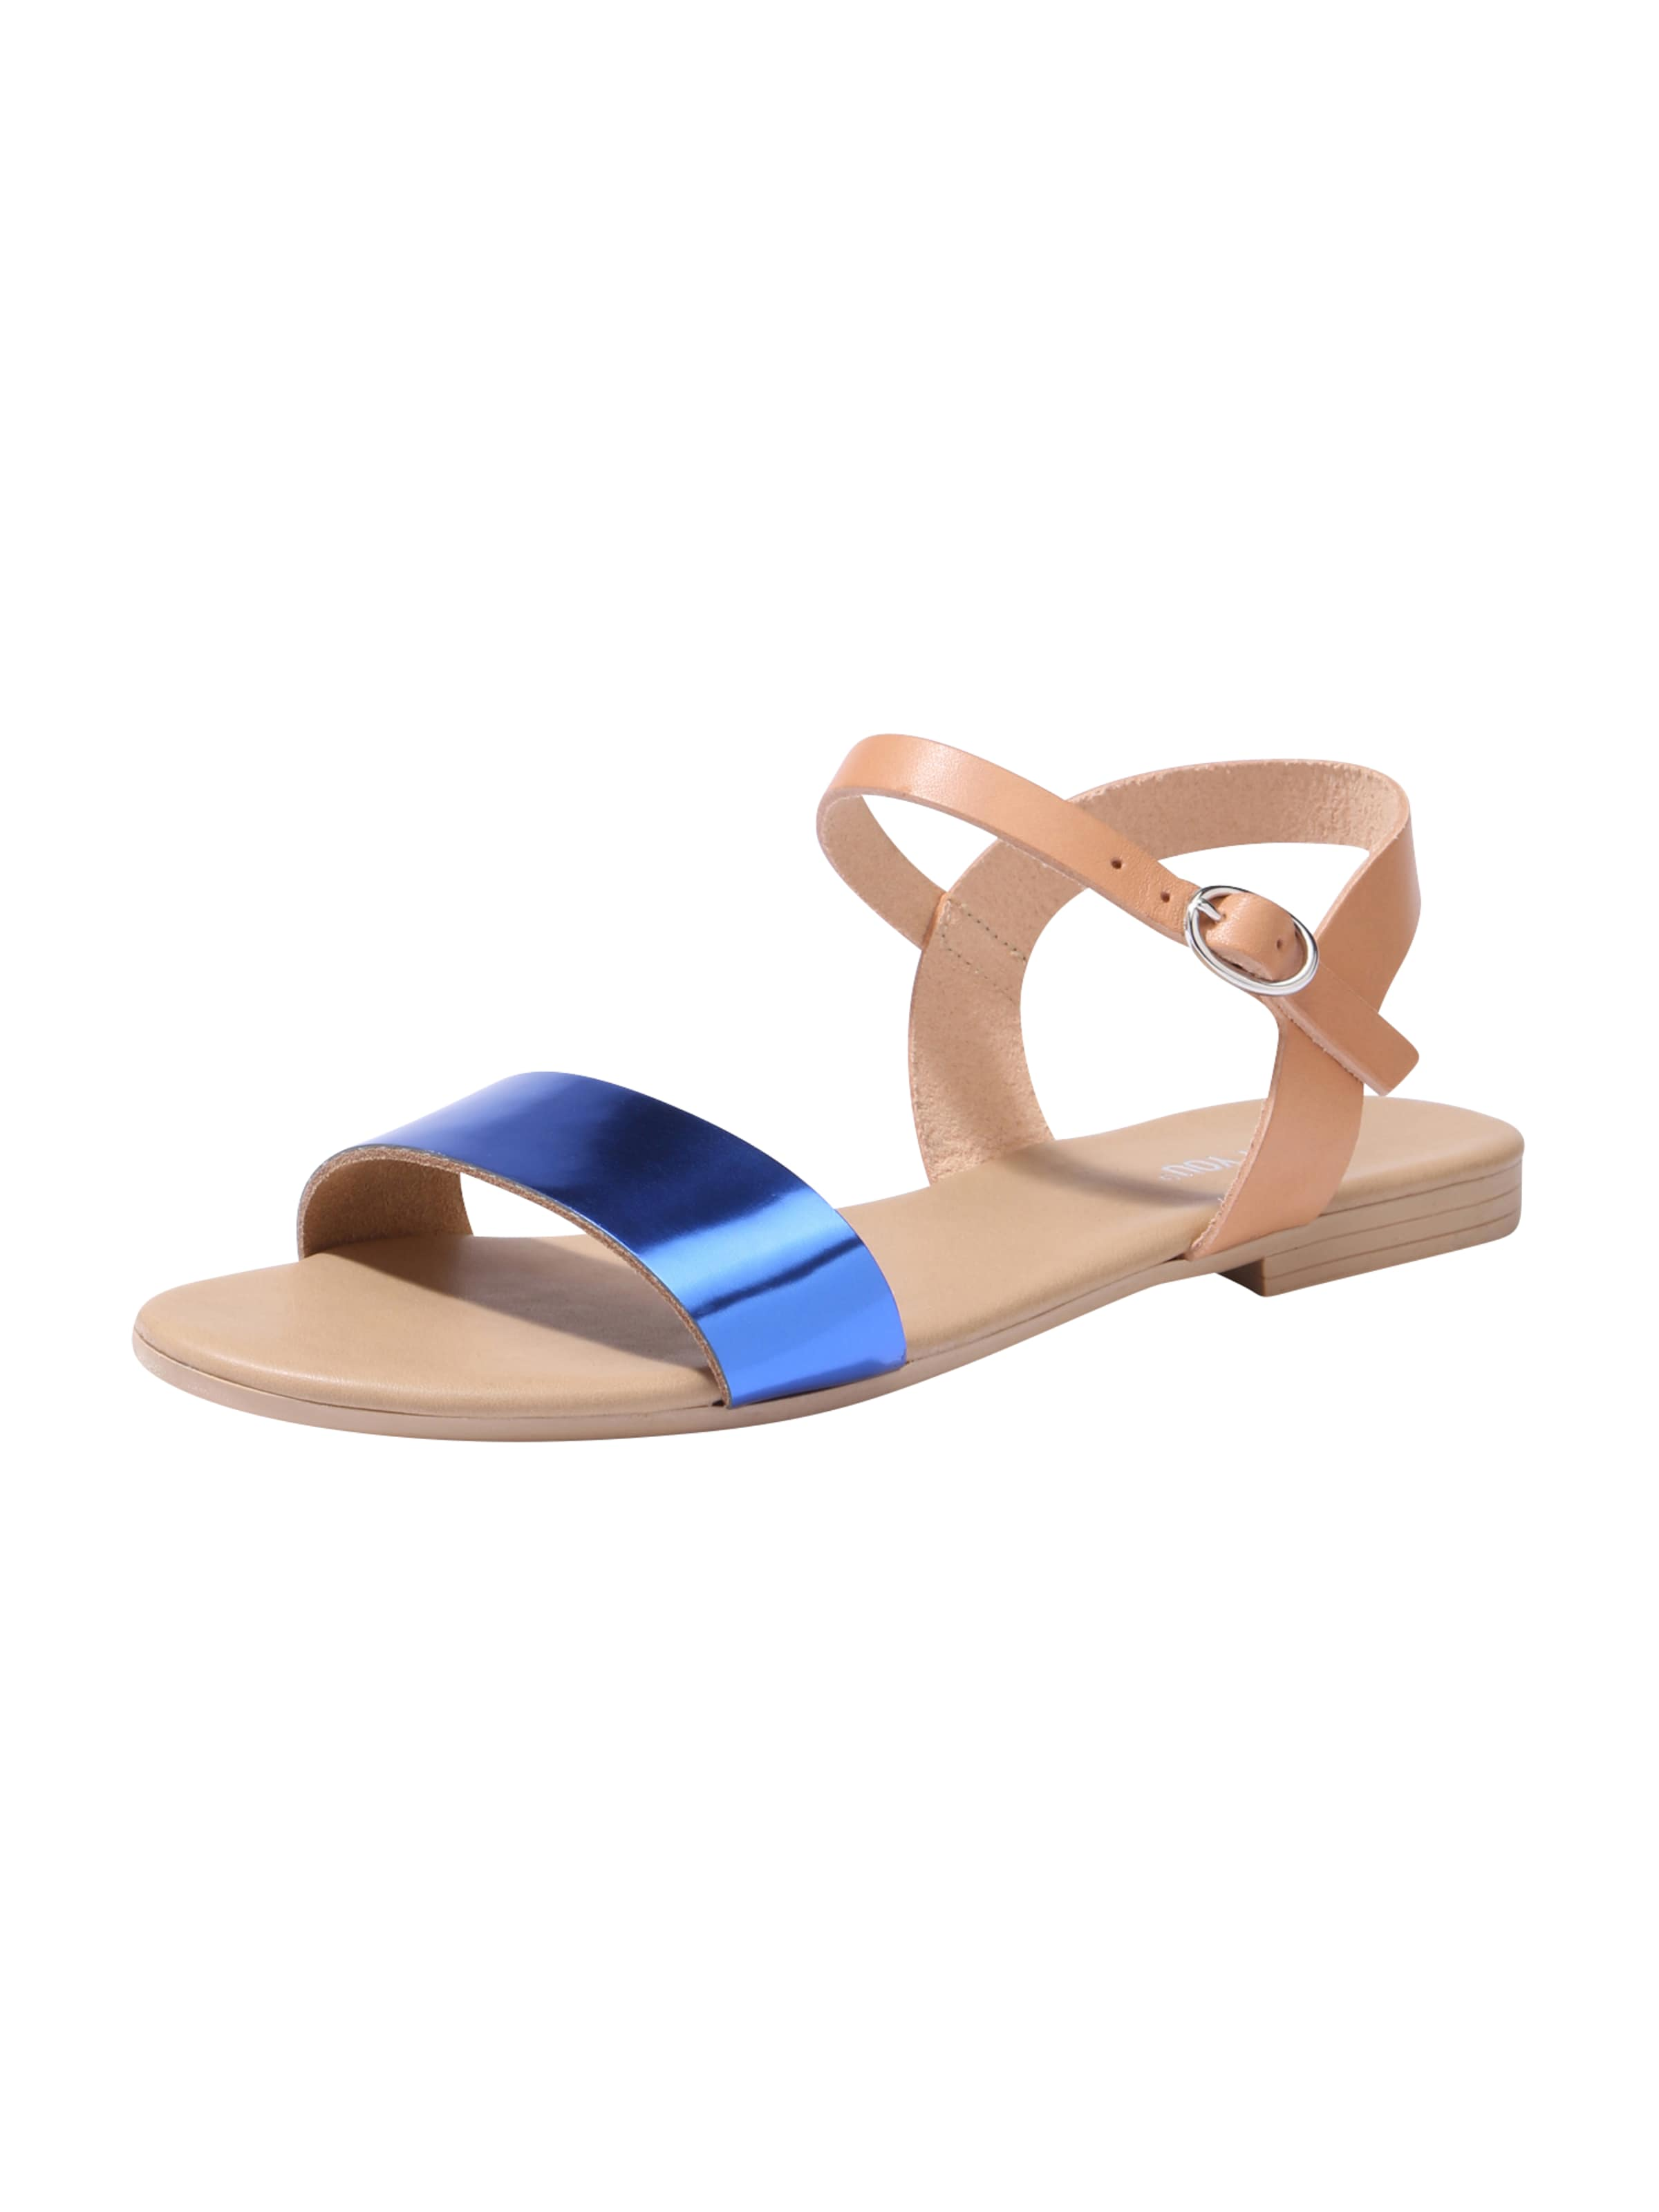 ABOUT YOU Riemchensandalen JENNIFER Verschleißfeste billige Schuhe